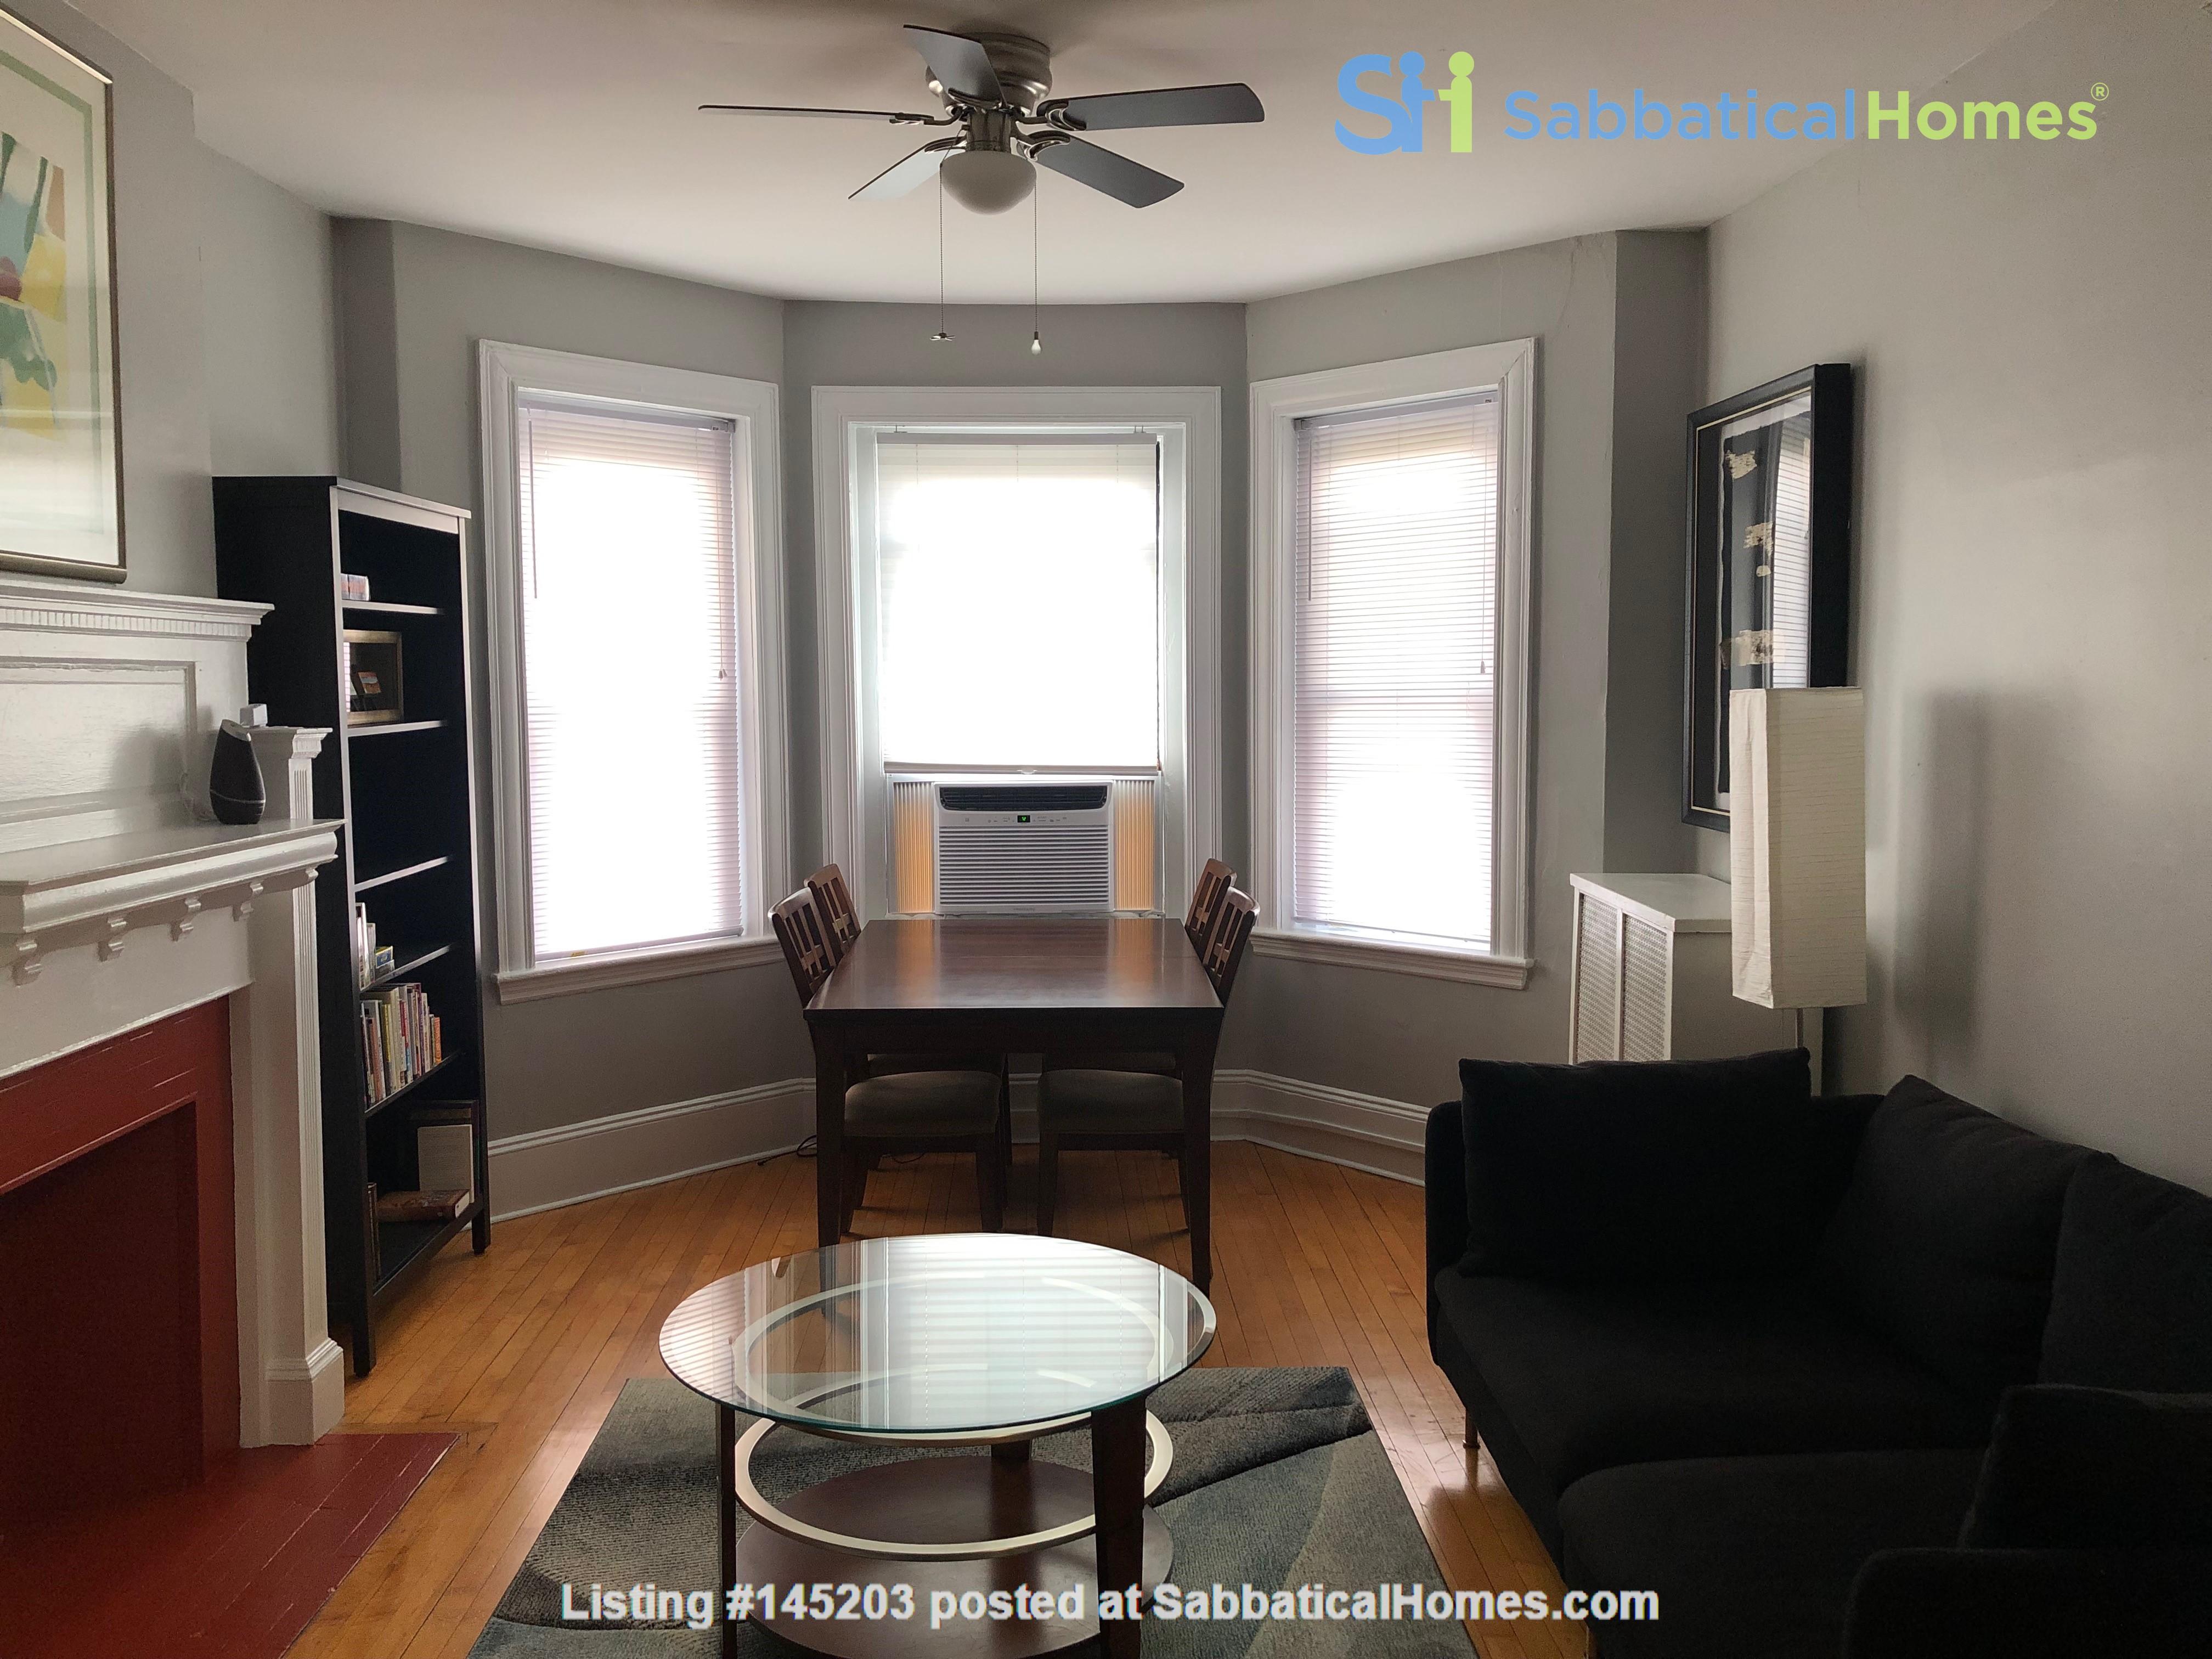 2bd/1ba Condo in Boston (Allston Neighborhood) near BU/BC/Harvard Home Rental in Boston, Massachusetts, United States 3